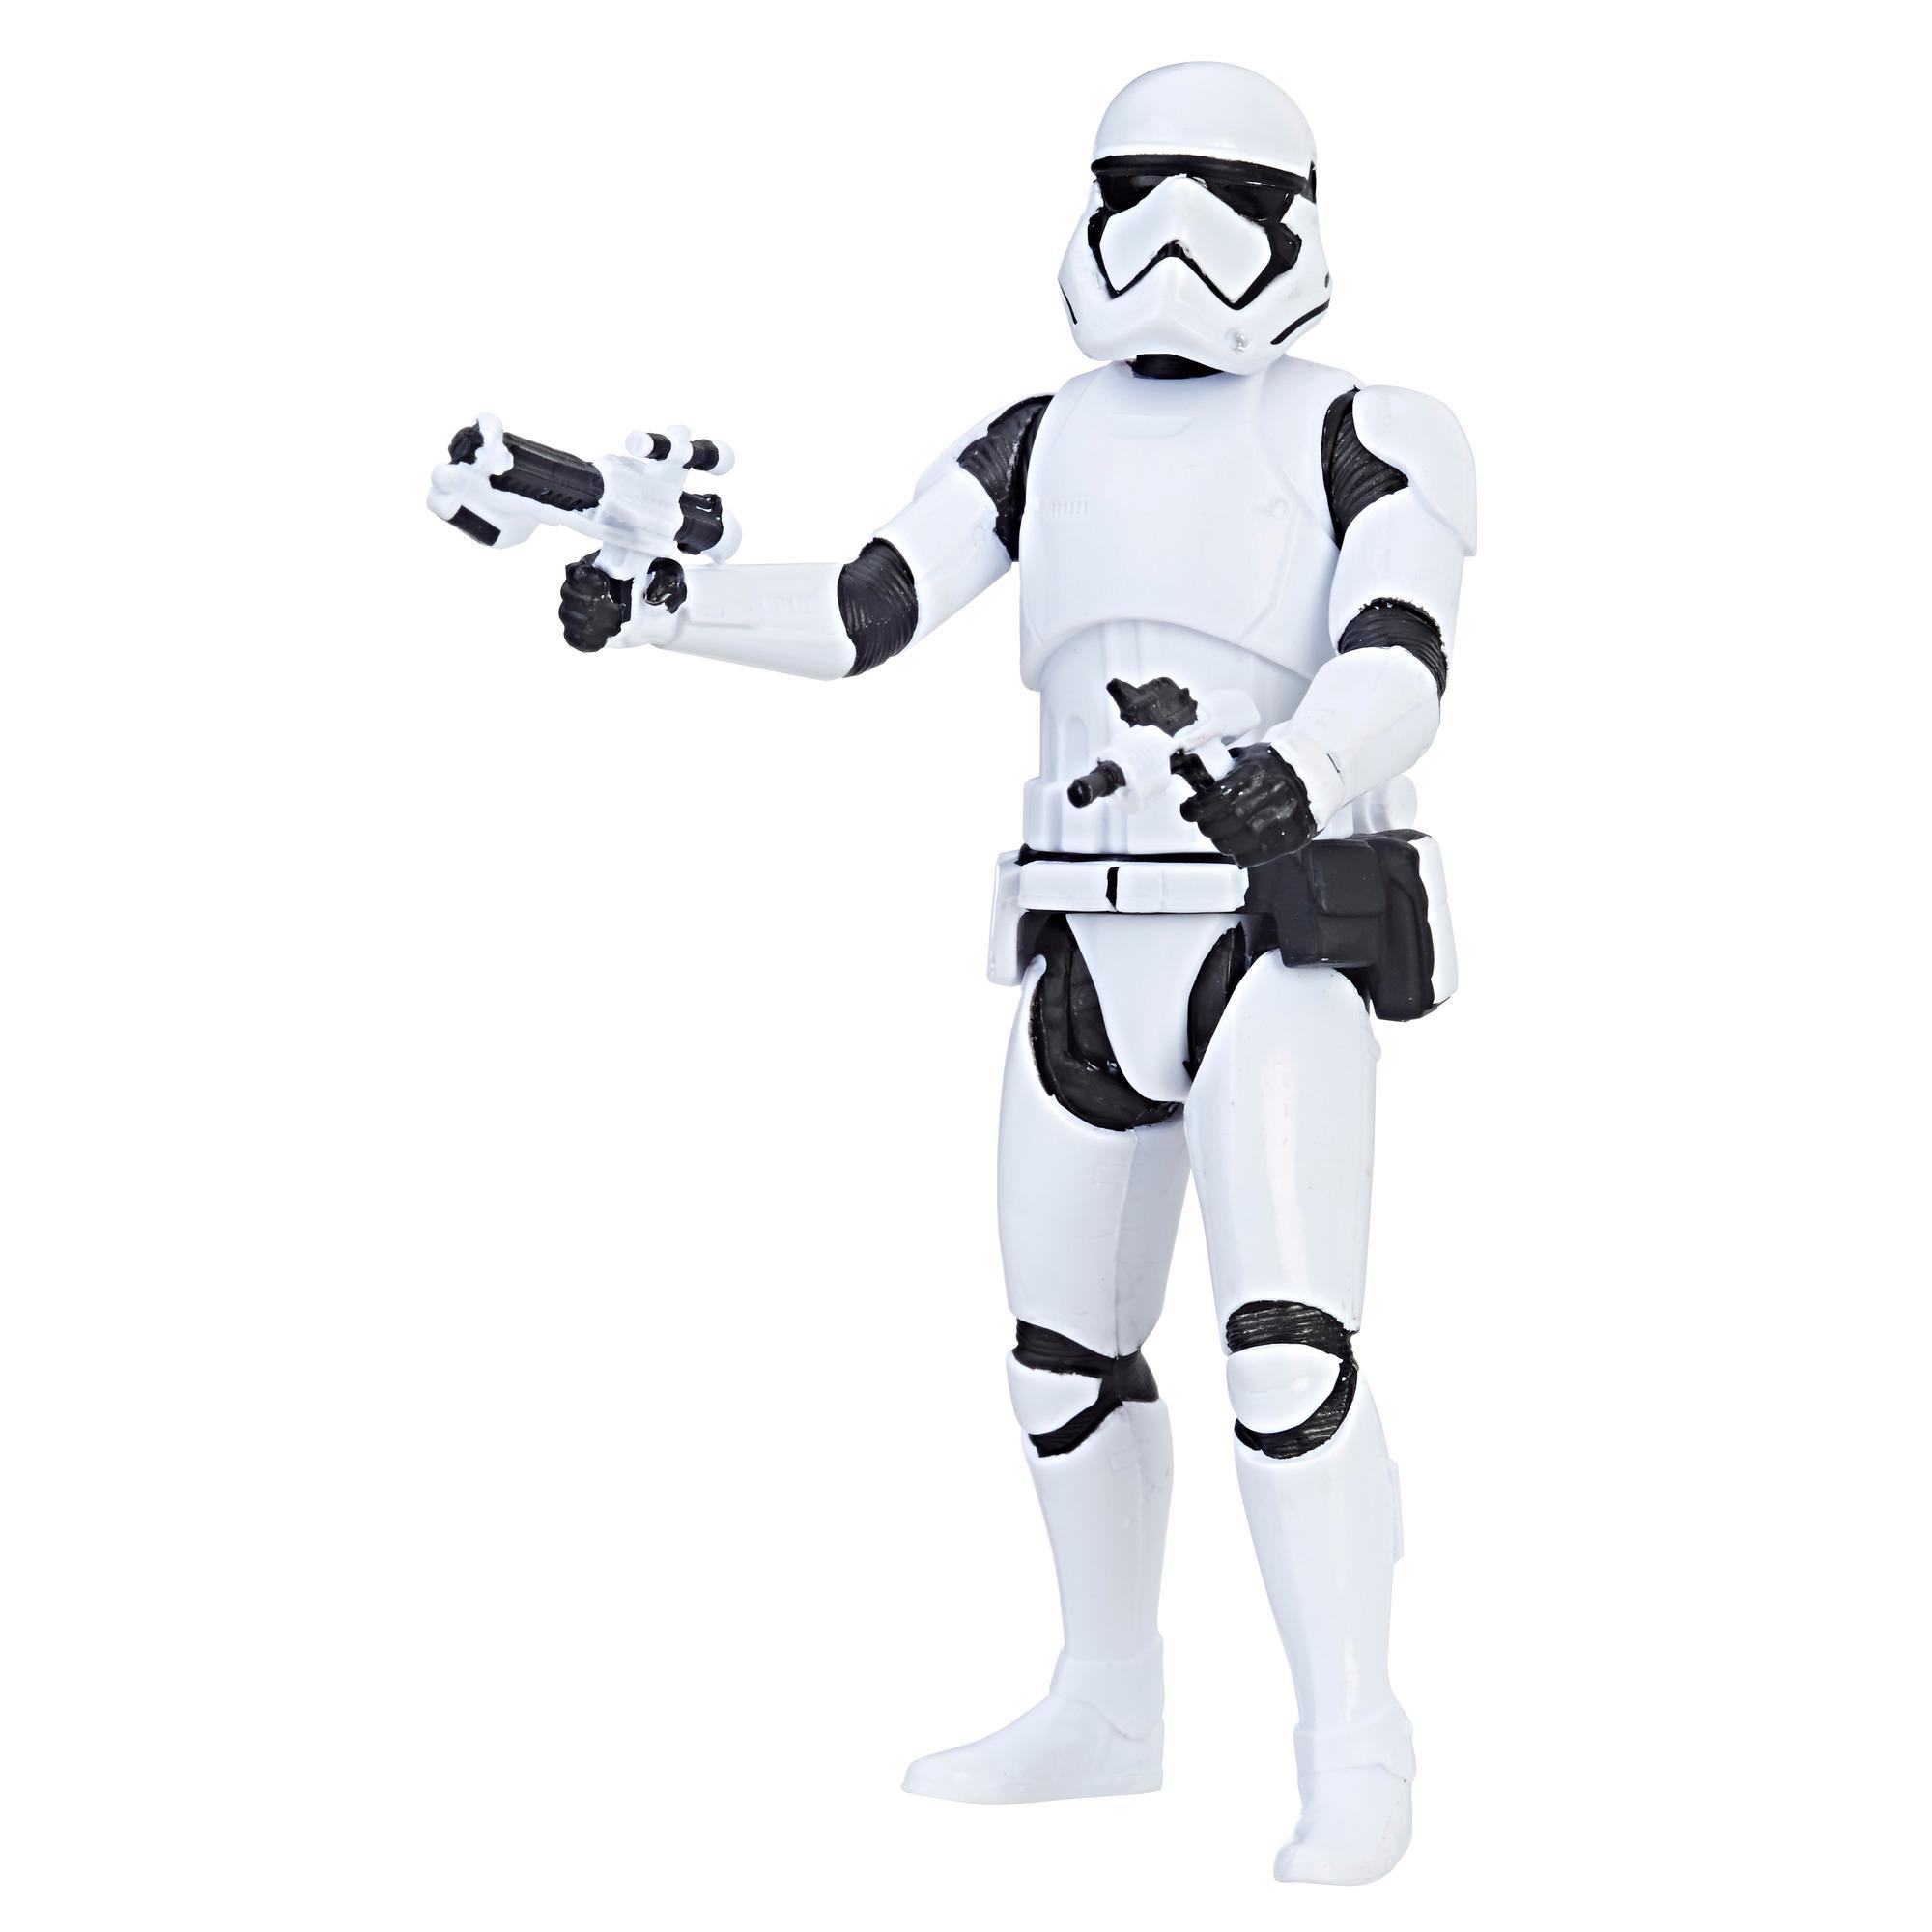 星際大戰電影8 3.75吋基本人物組First Order Stormtrooper